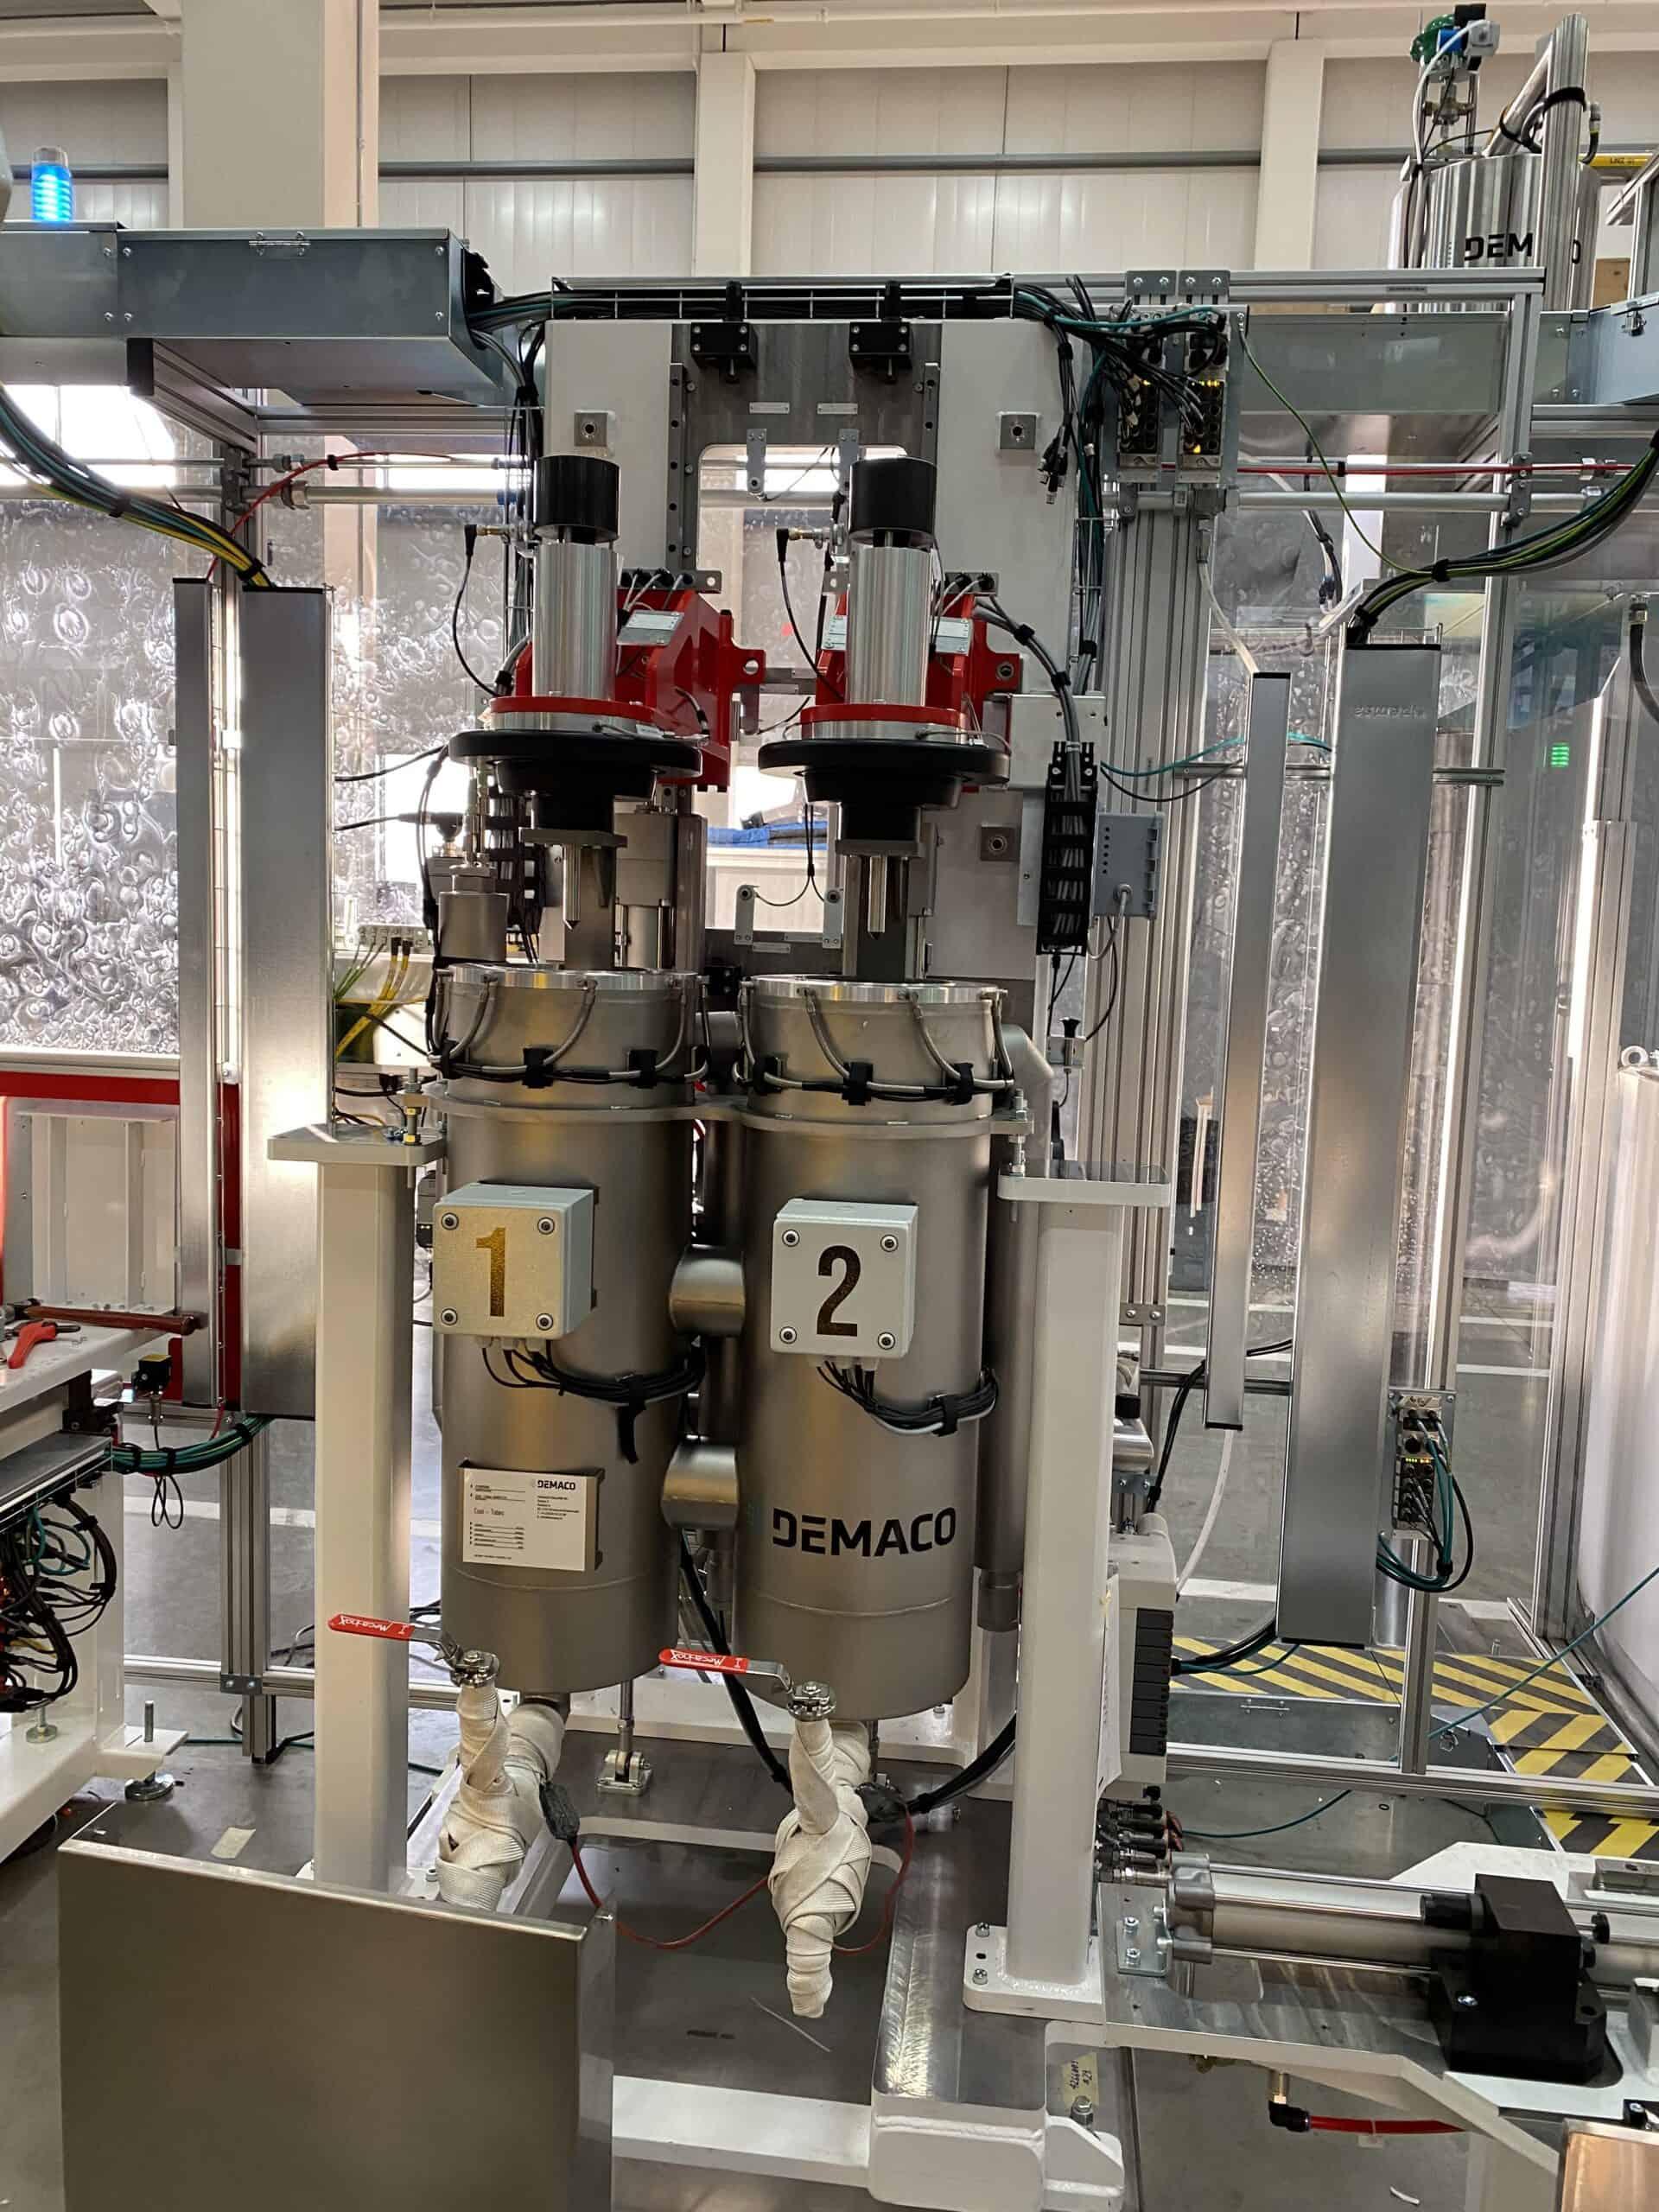 Cryogenic cooling trays